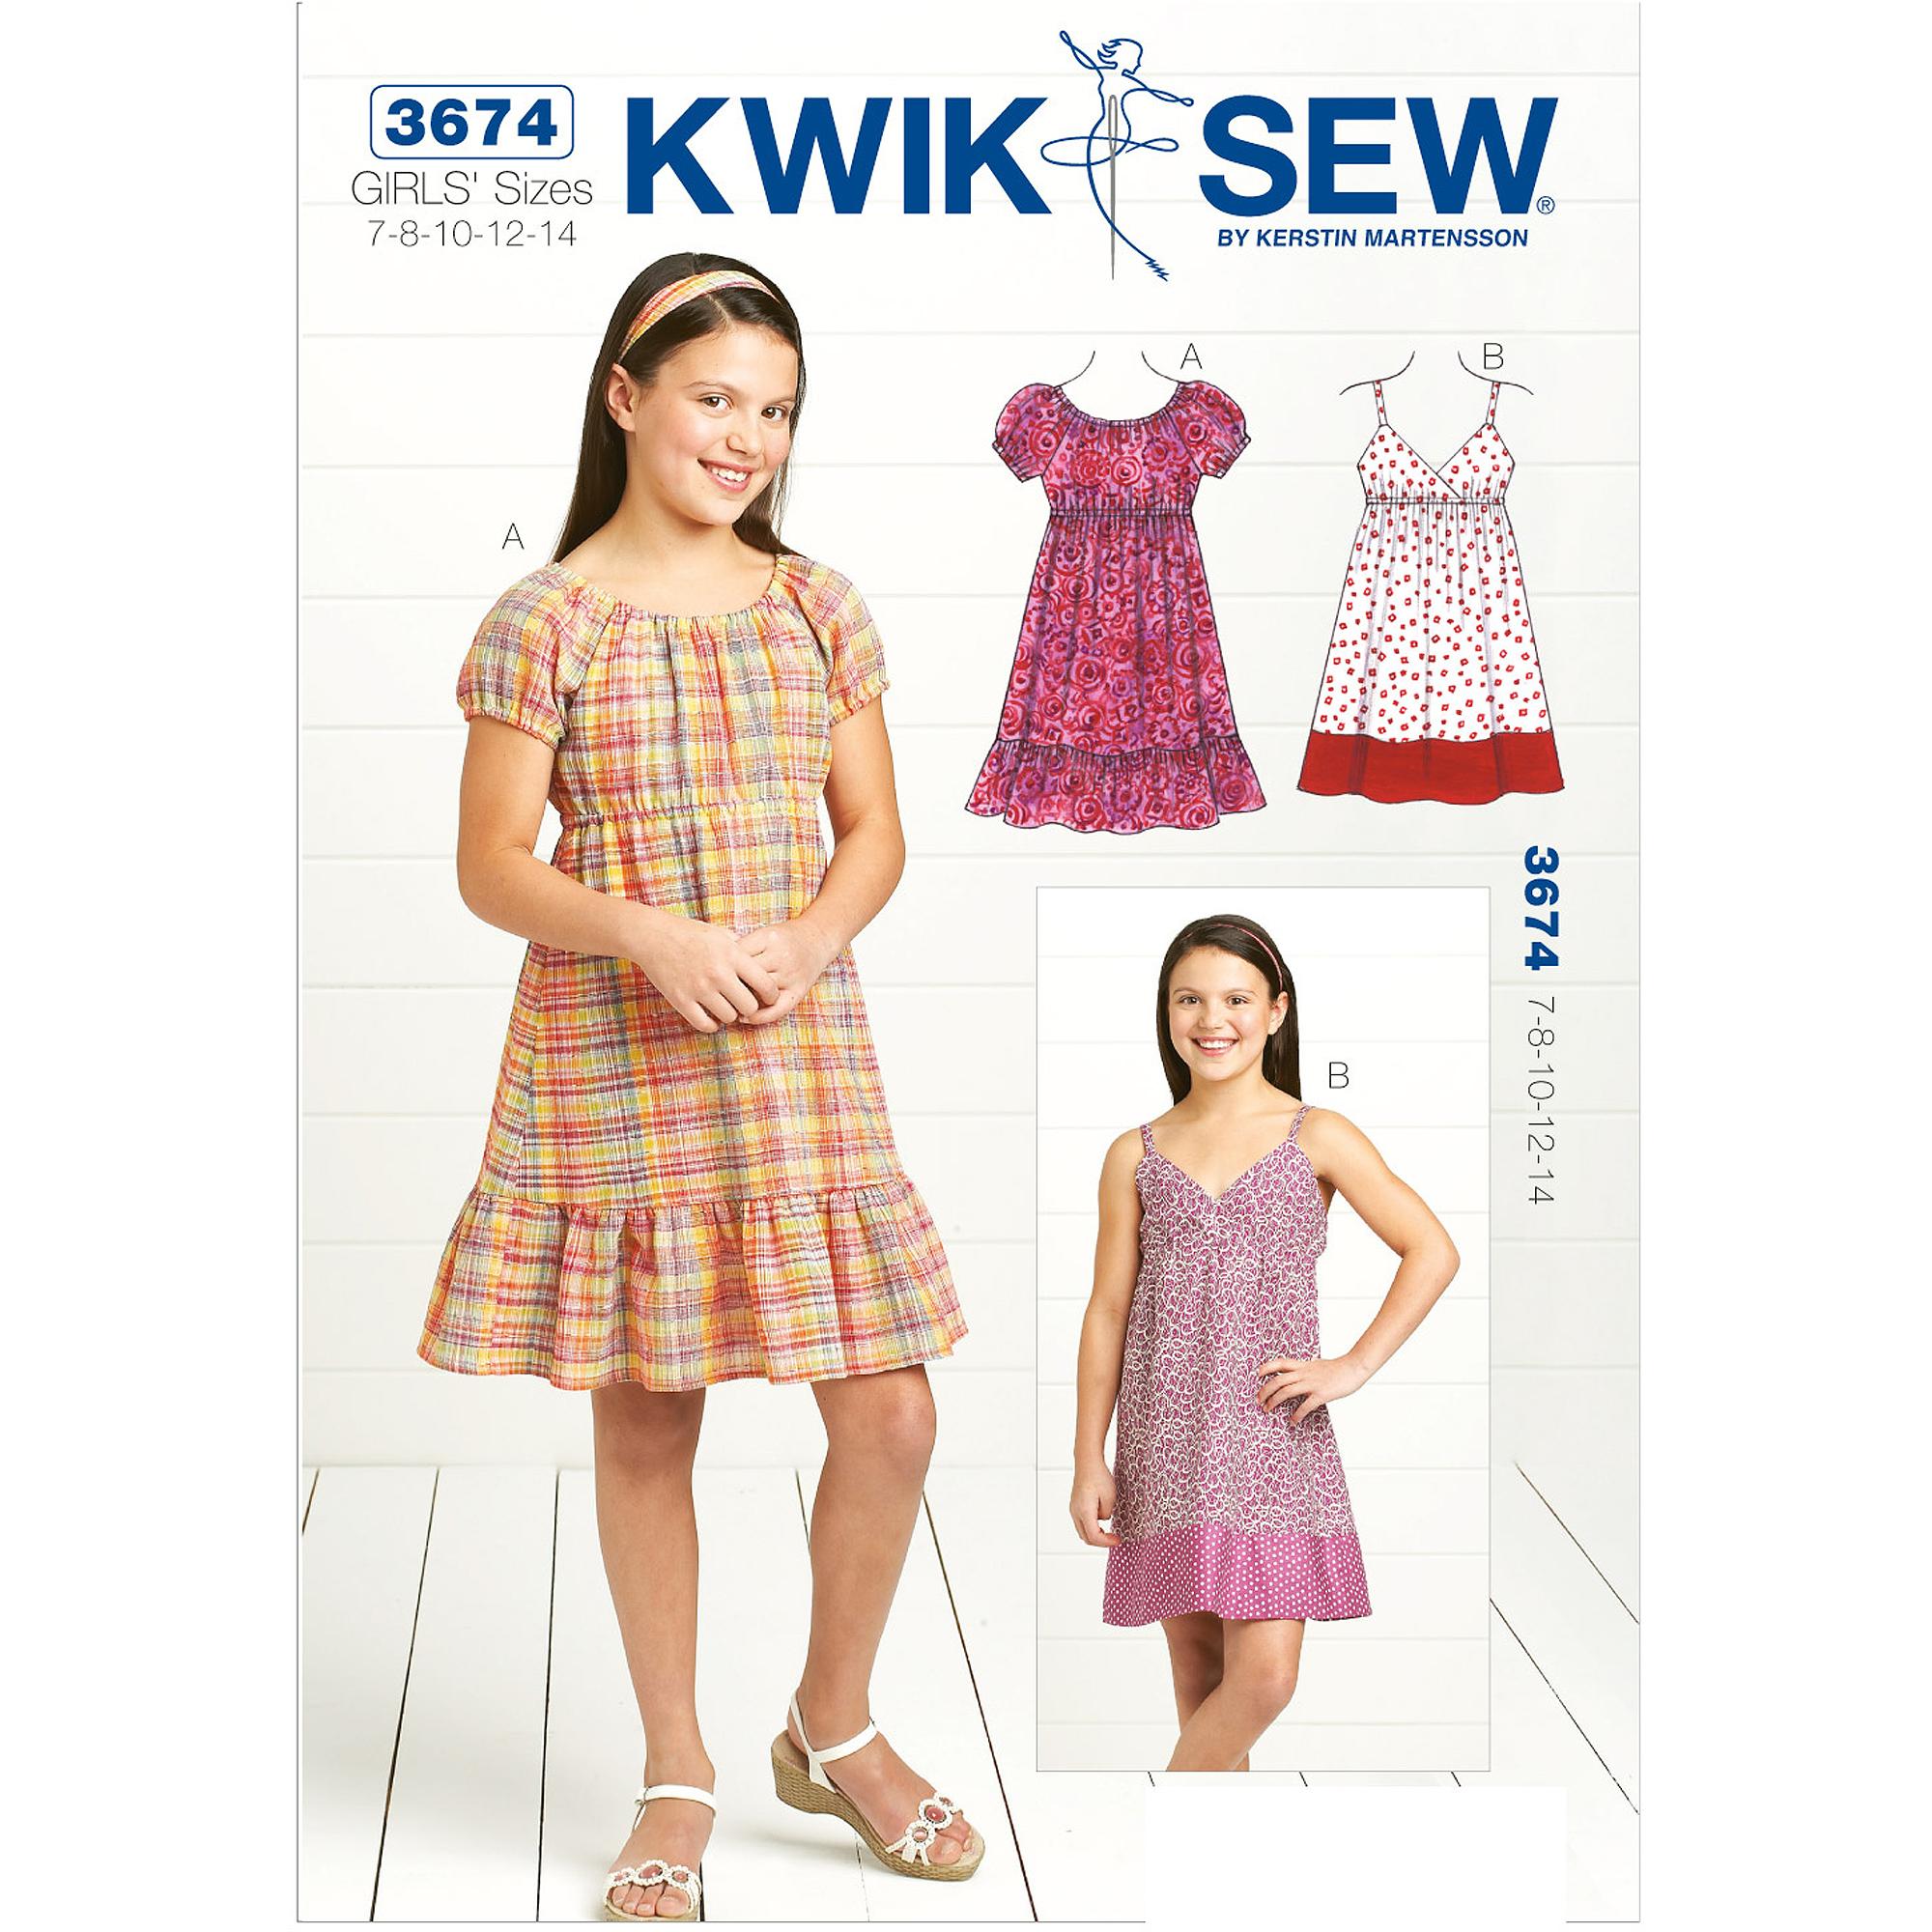 Kwik Sew Pattern Dresses, (7, 8, 10, 12, 14)